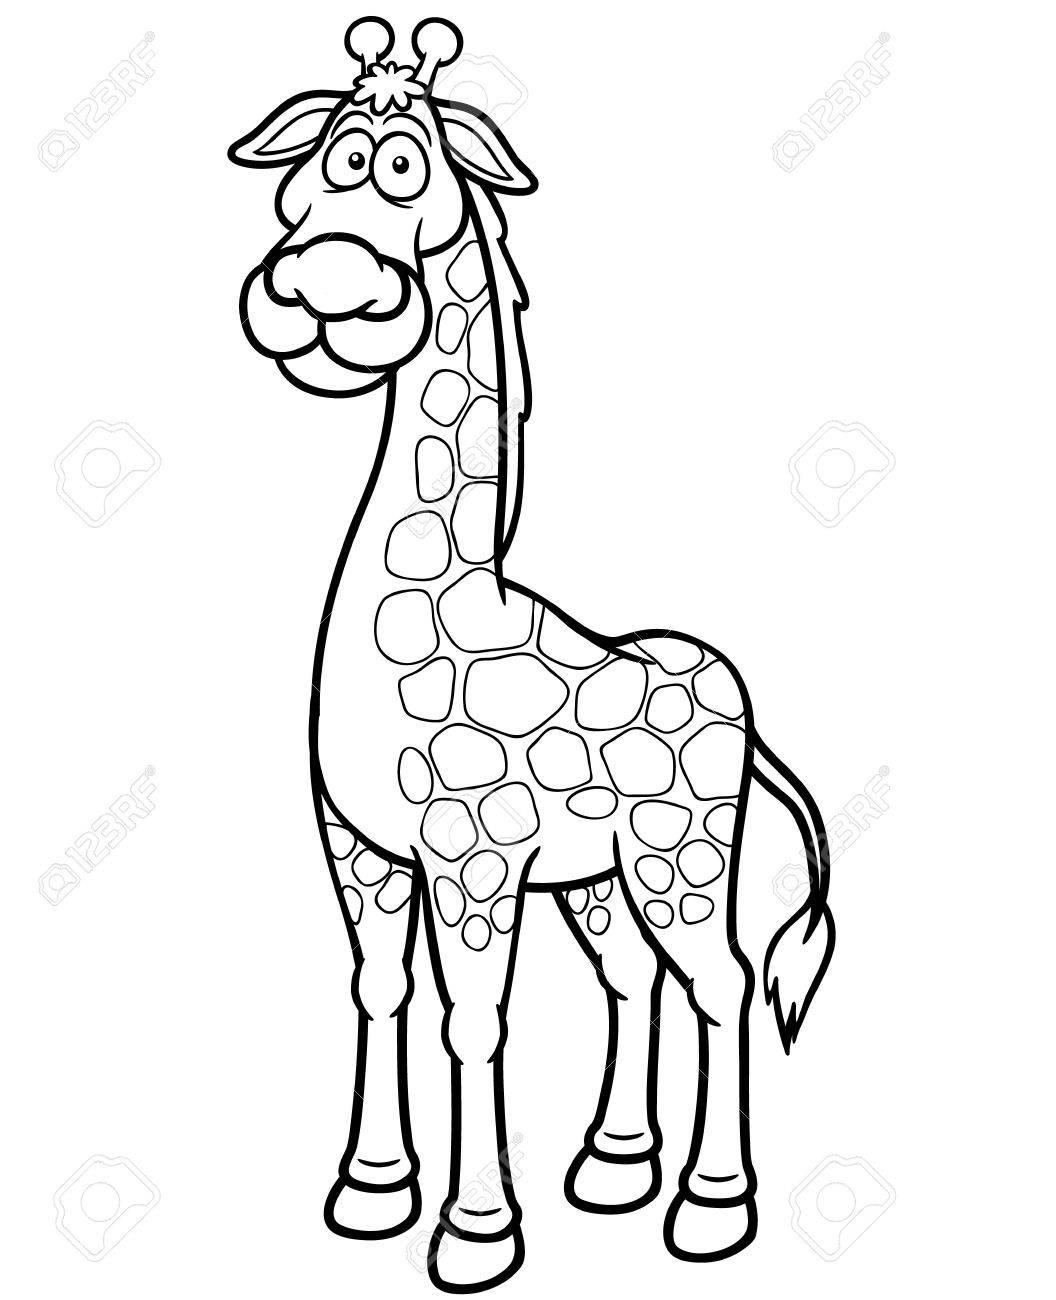 vector illustration of giraffe cartoon coloring book royalty